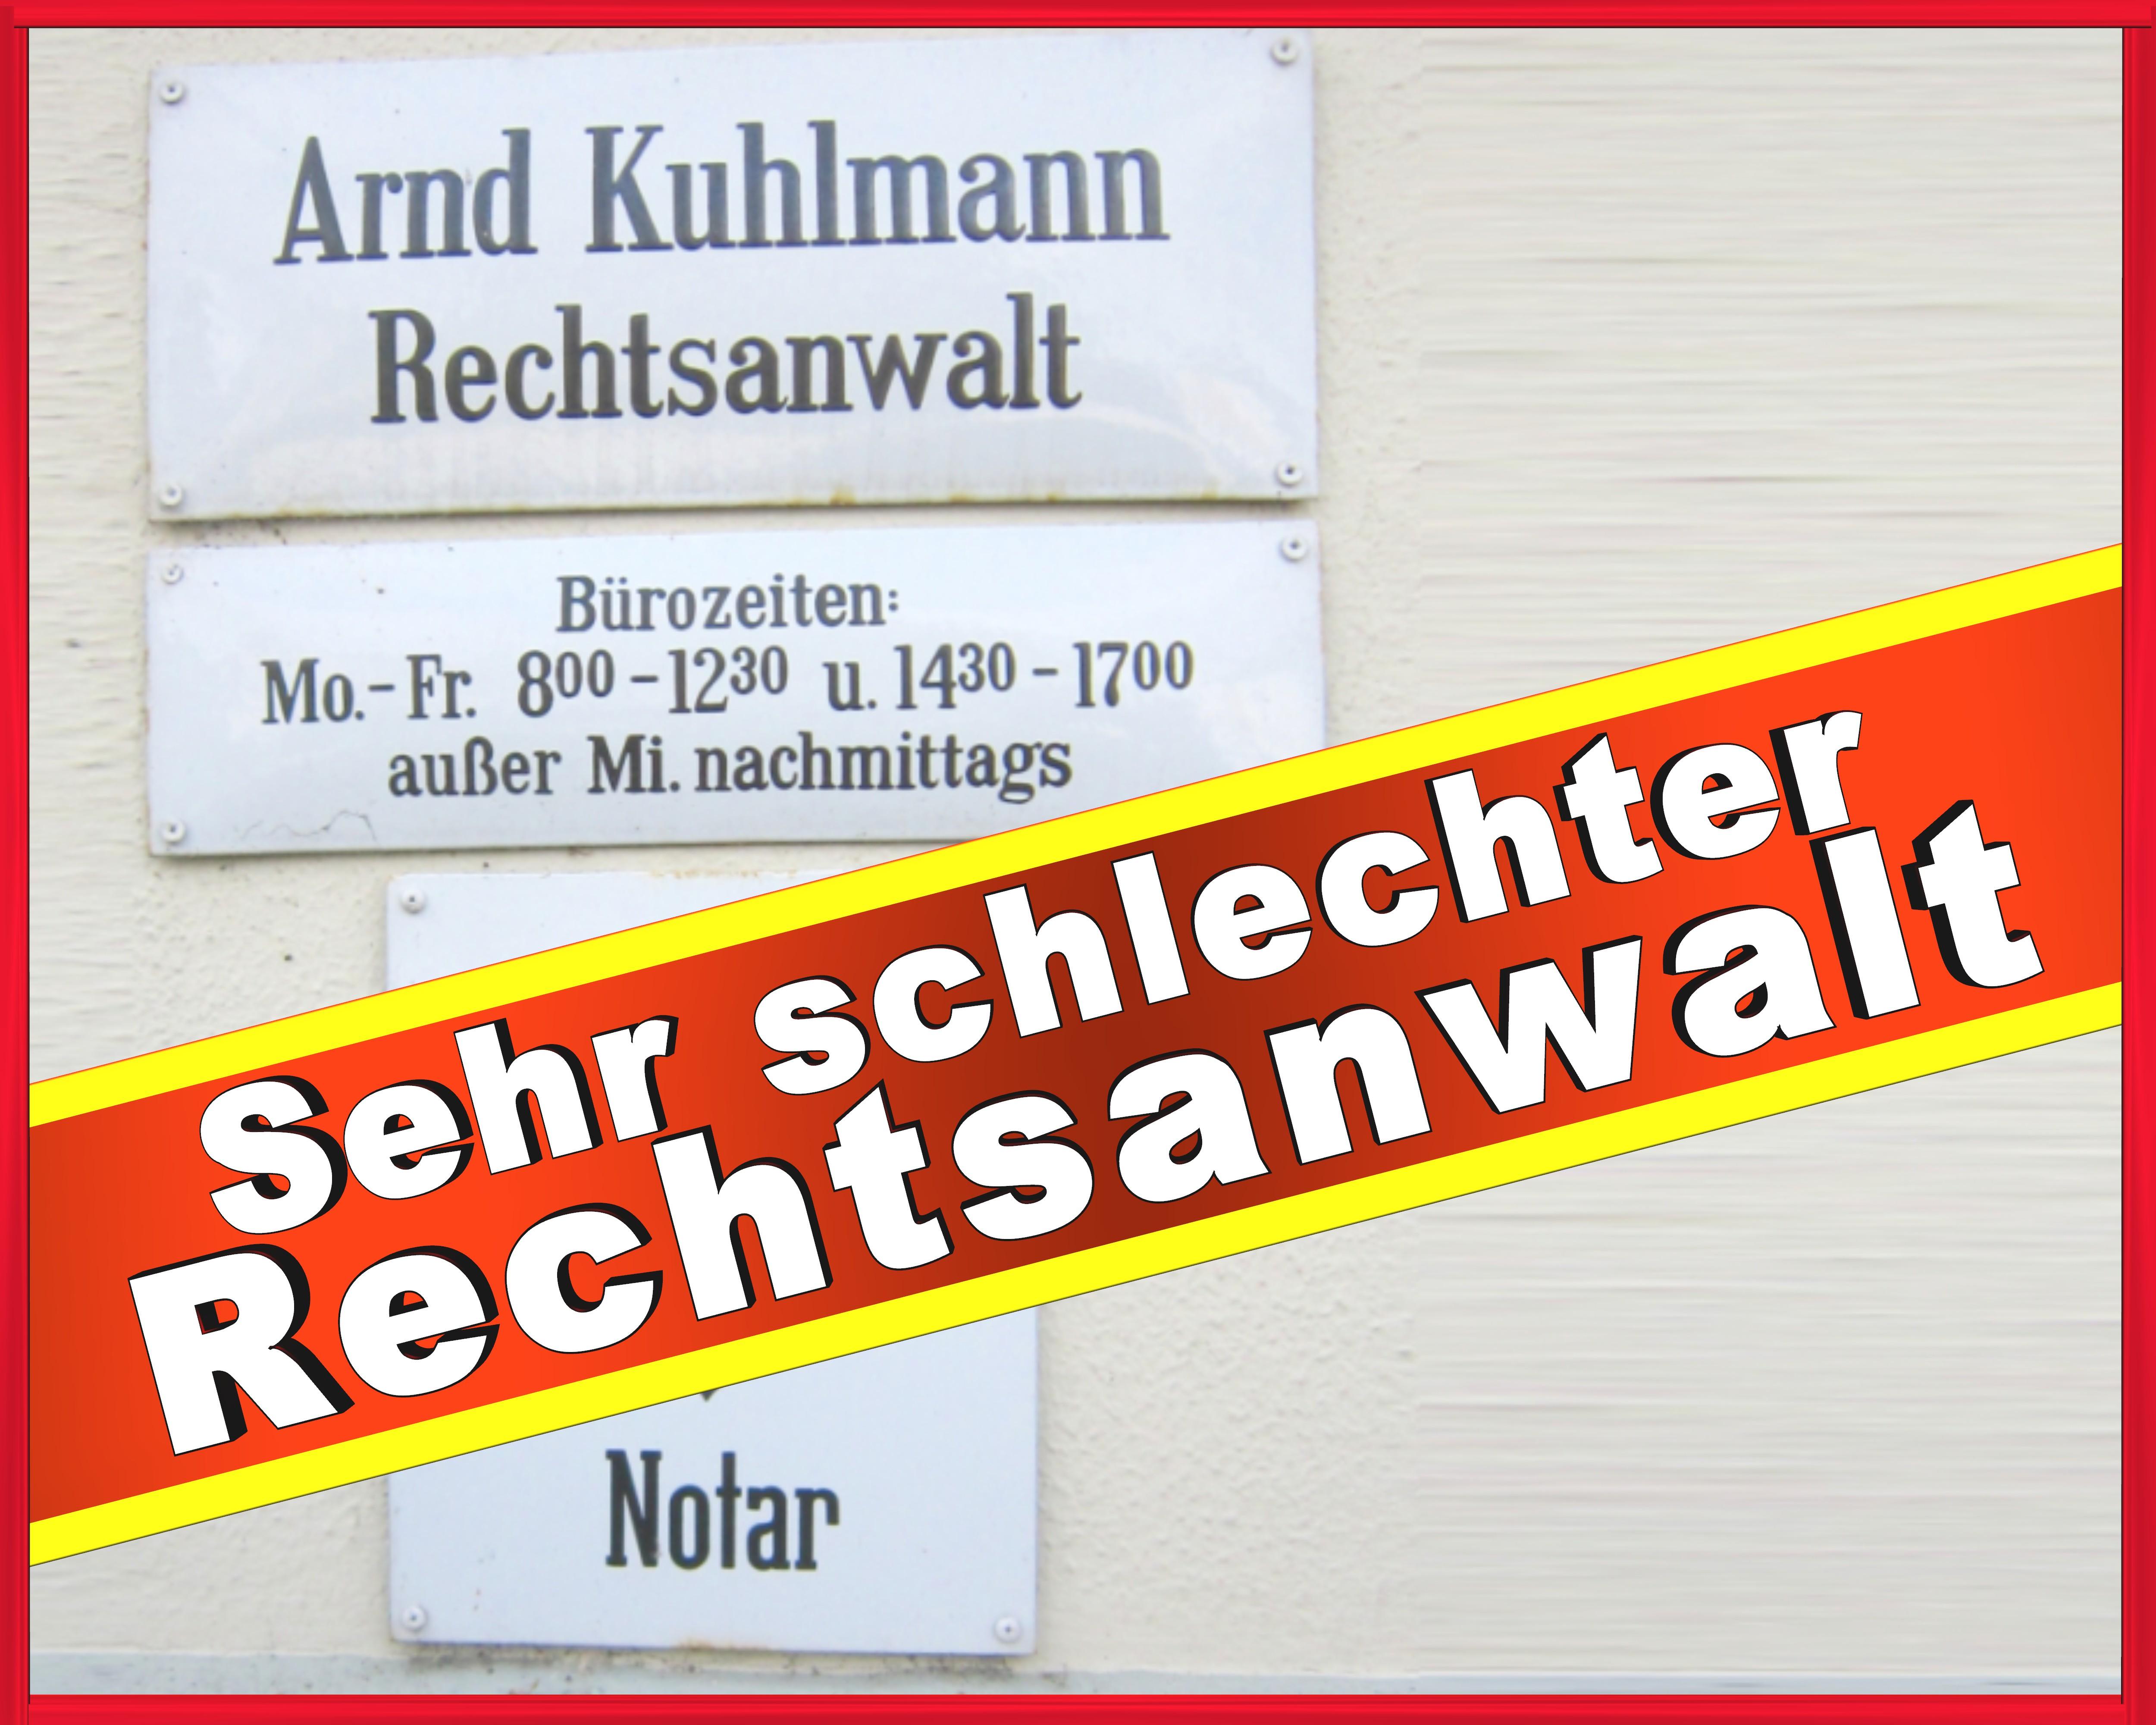 Rechtsanwalt Arnd Kuhlmann 1 (1)